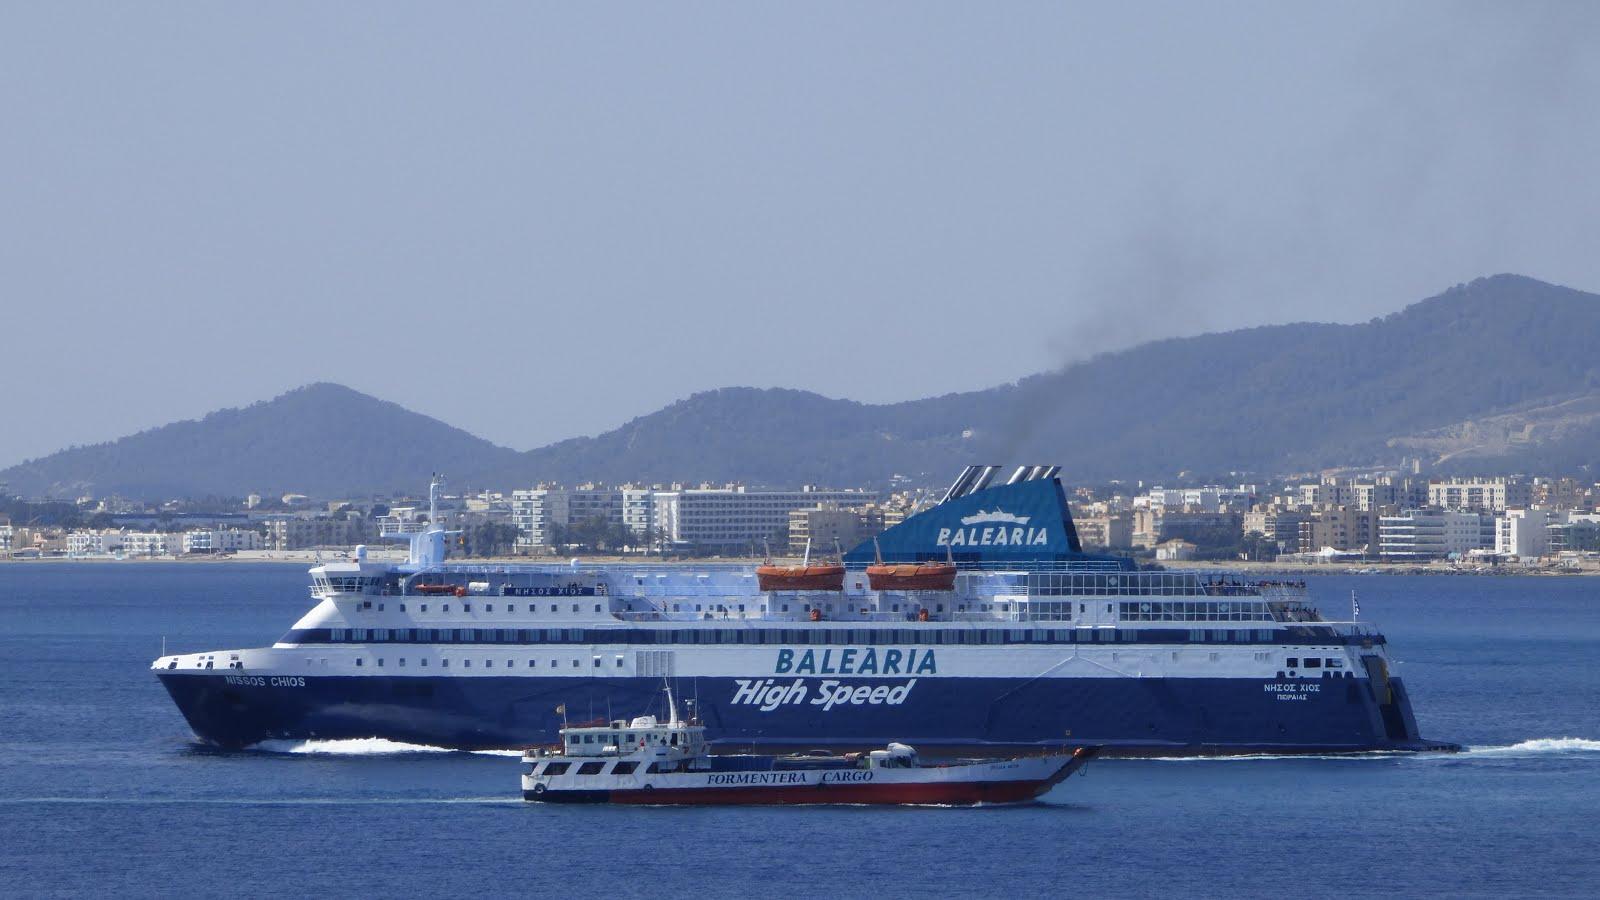 Ferrybalear la naviera bale ria sigue rastreando puertos for Oficinas balearia